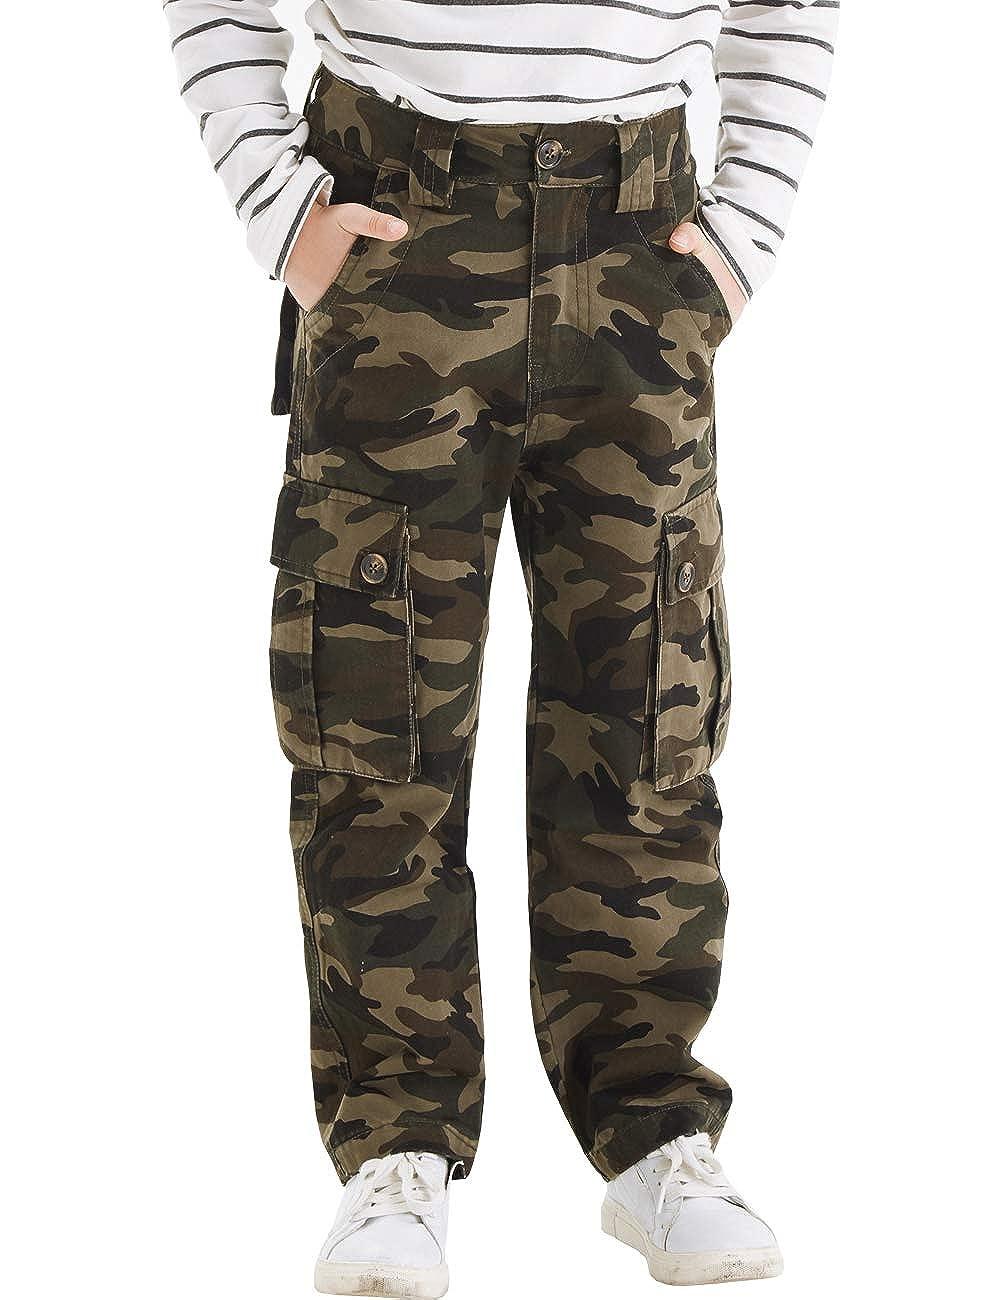 1b60d59e187 Amazon.com: BYCR Boys' Skinny Cargo Jogging Pants Cotton Regular Straight  Stretch Trousers: Clothing